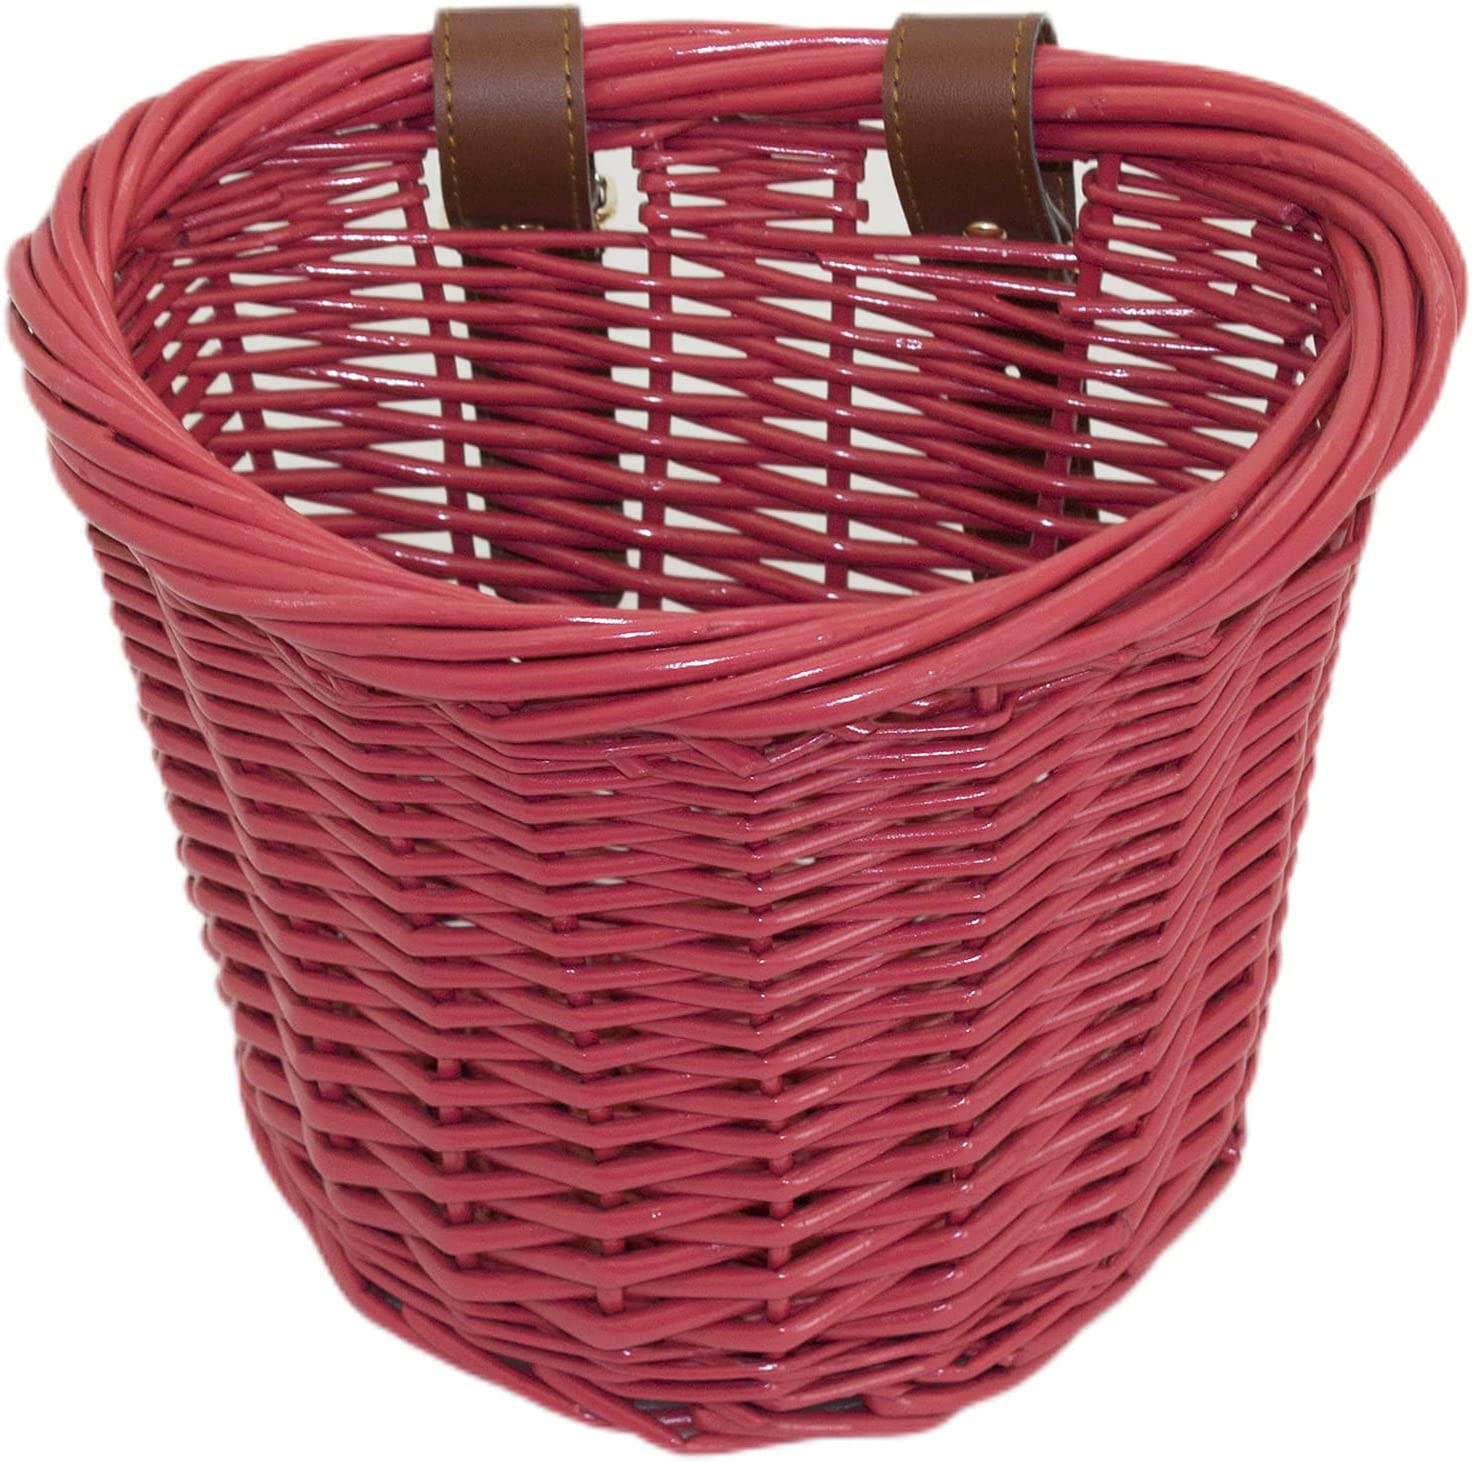 YRJJ Wicker Bike Save money Free shipping / New Basket Children's Straps Leather Front Han